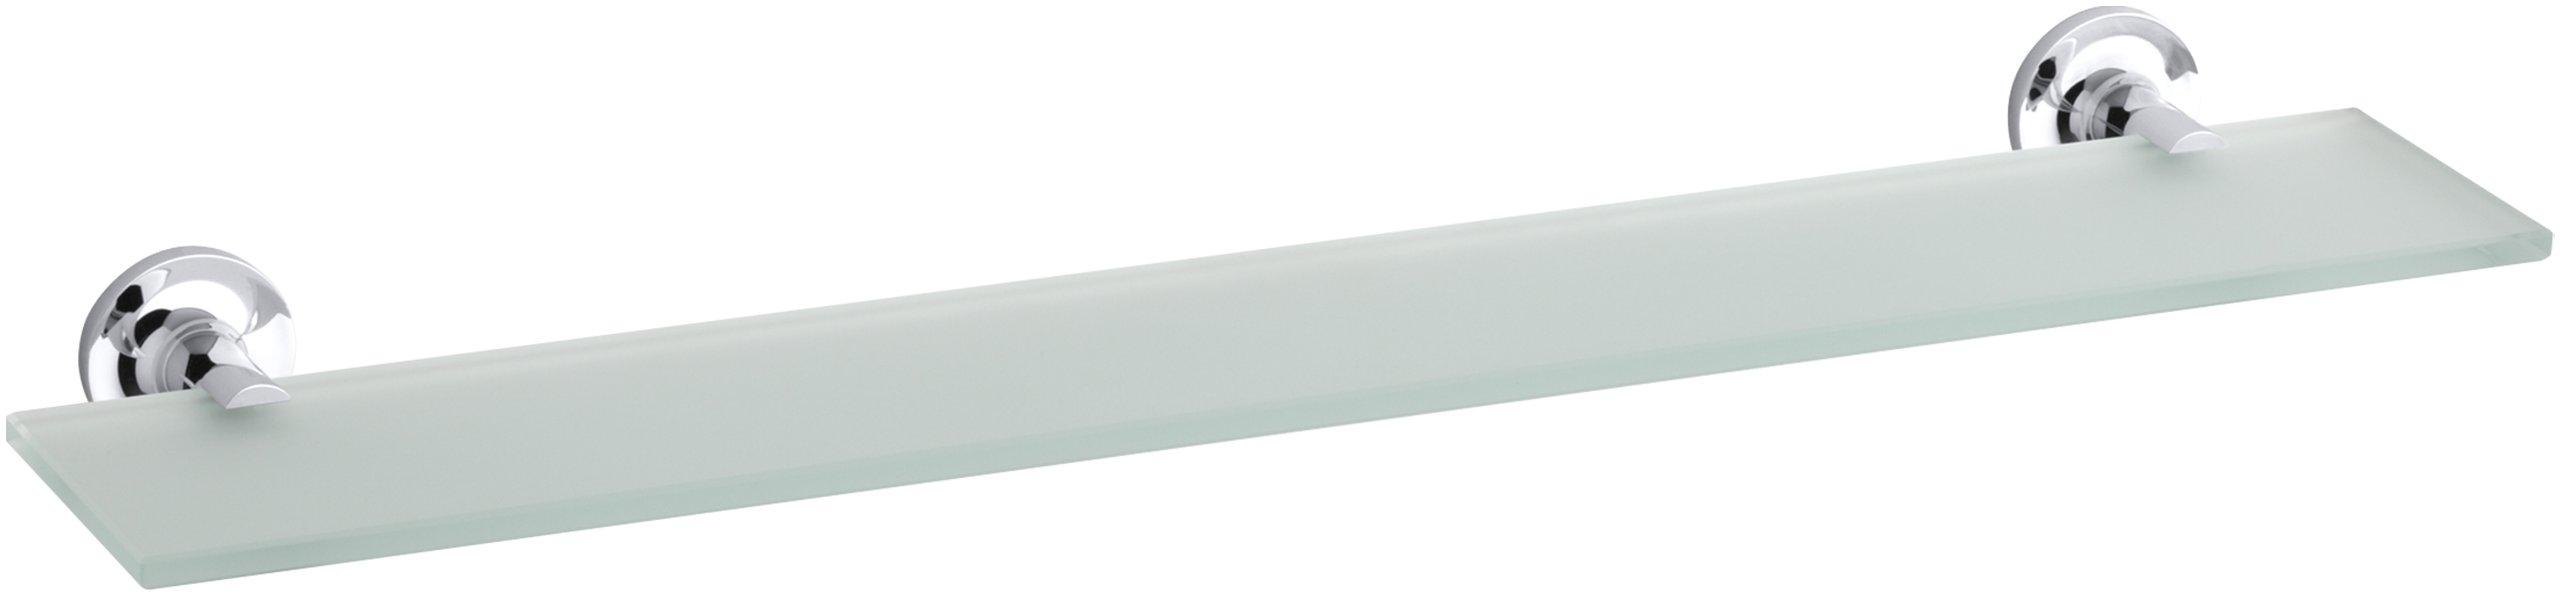 KOHLER K-14440-CP Purist Glass Shelf, Polished Chrome by Kohler